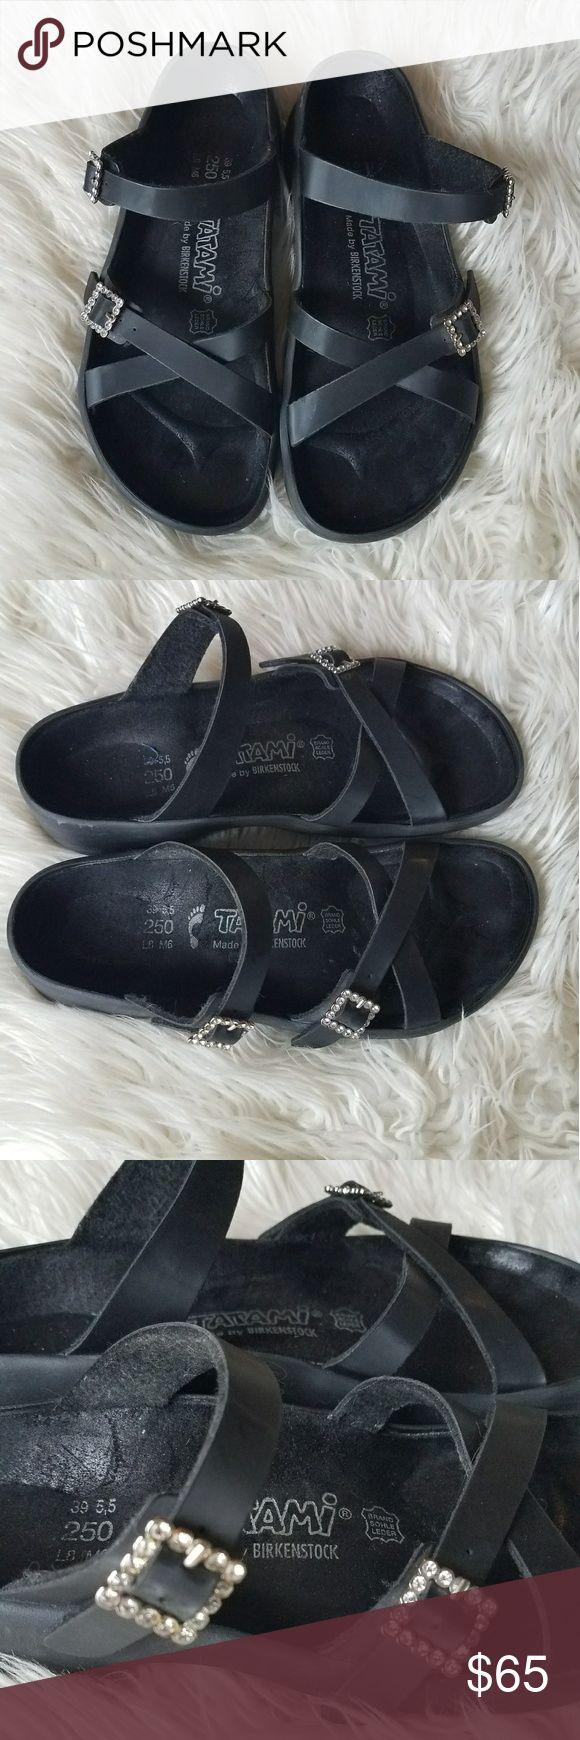 TATAMI Birkenstock Black Strappy Buckle Sandal TATAMI Birkenstock Black Strappy Buckle Sandals.  Size 8 Birkenstock Shoes Sandals